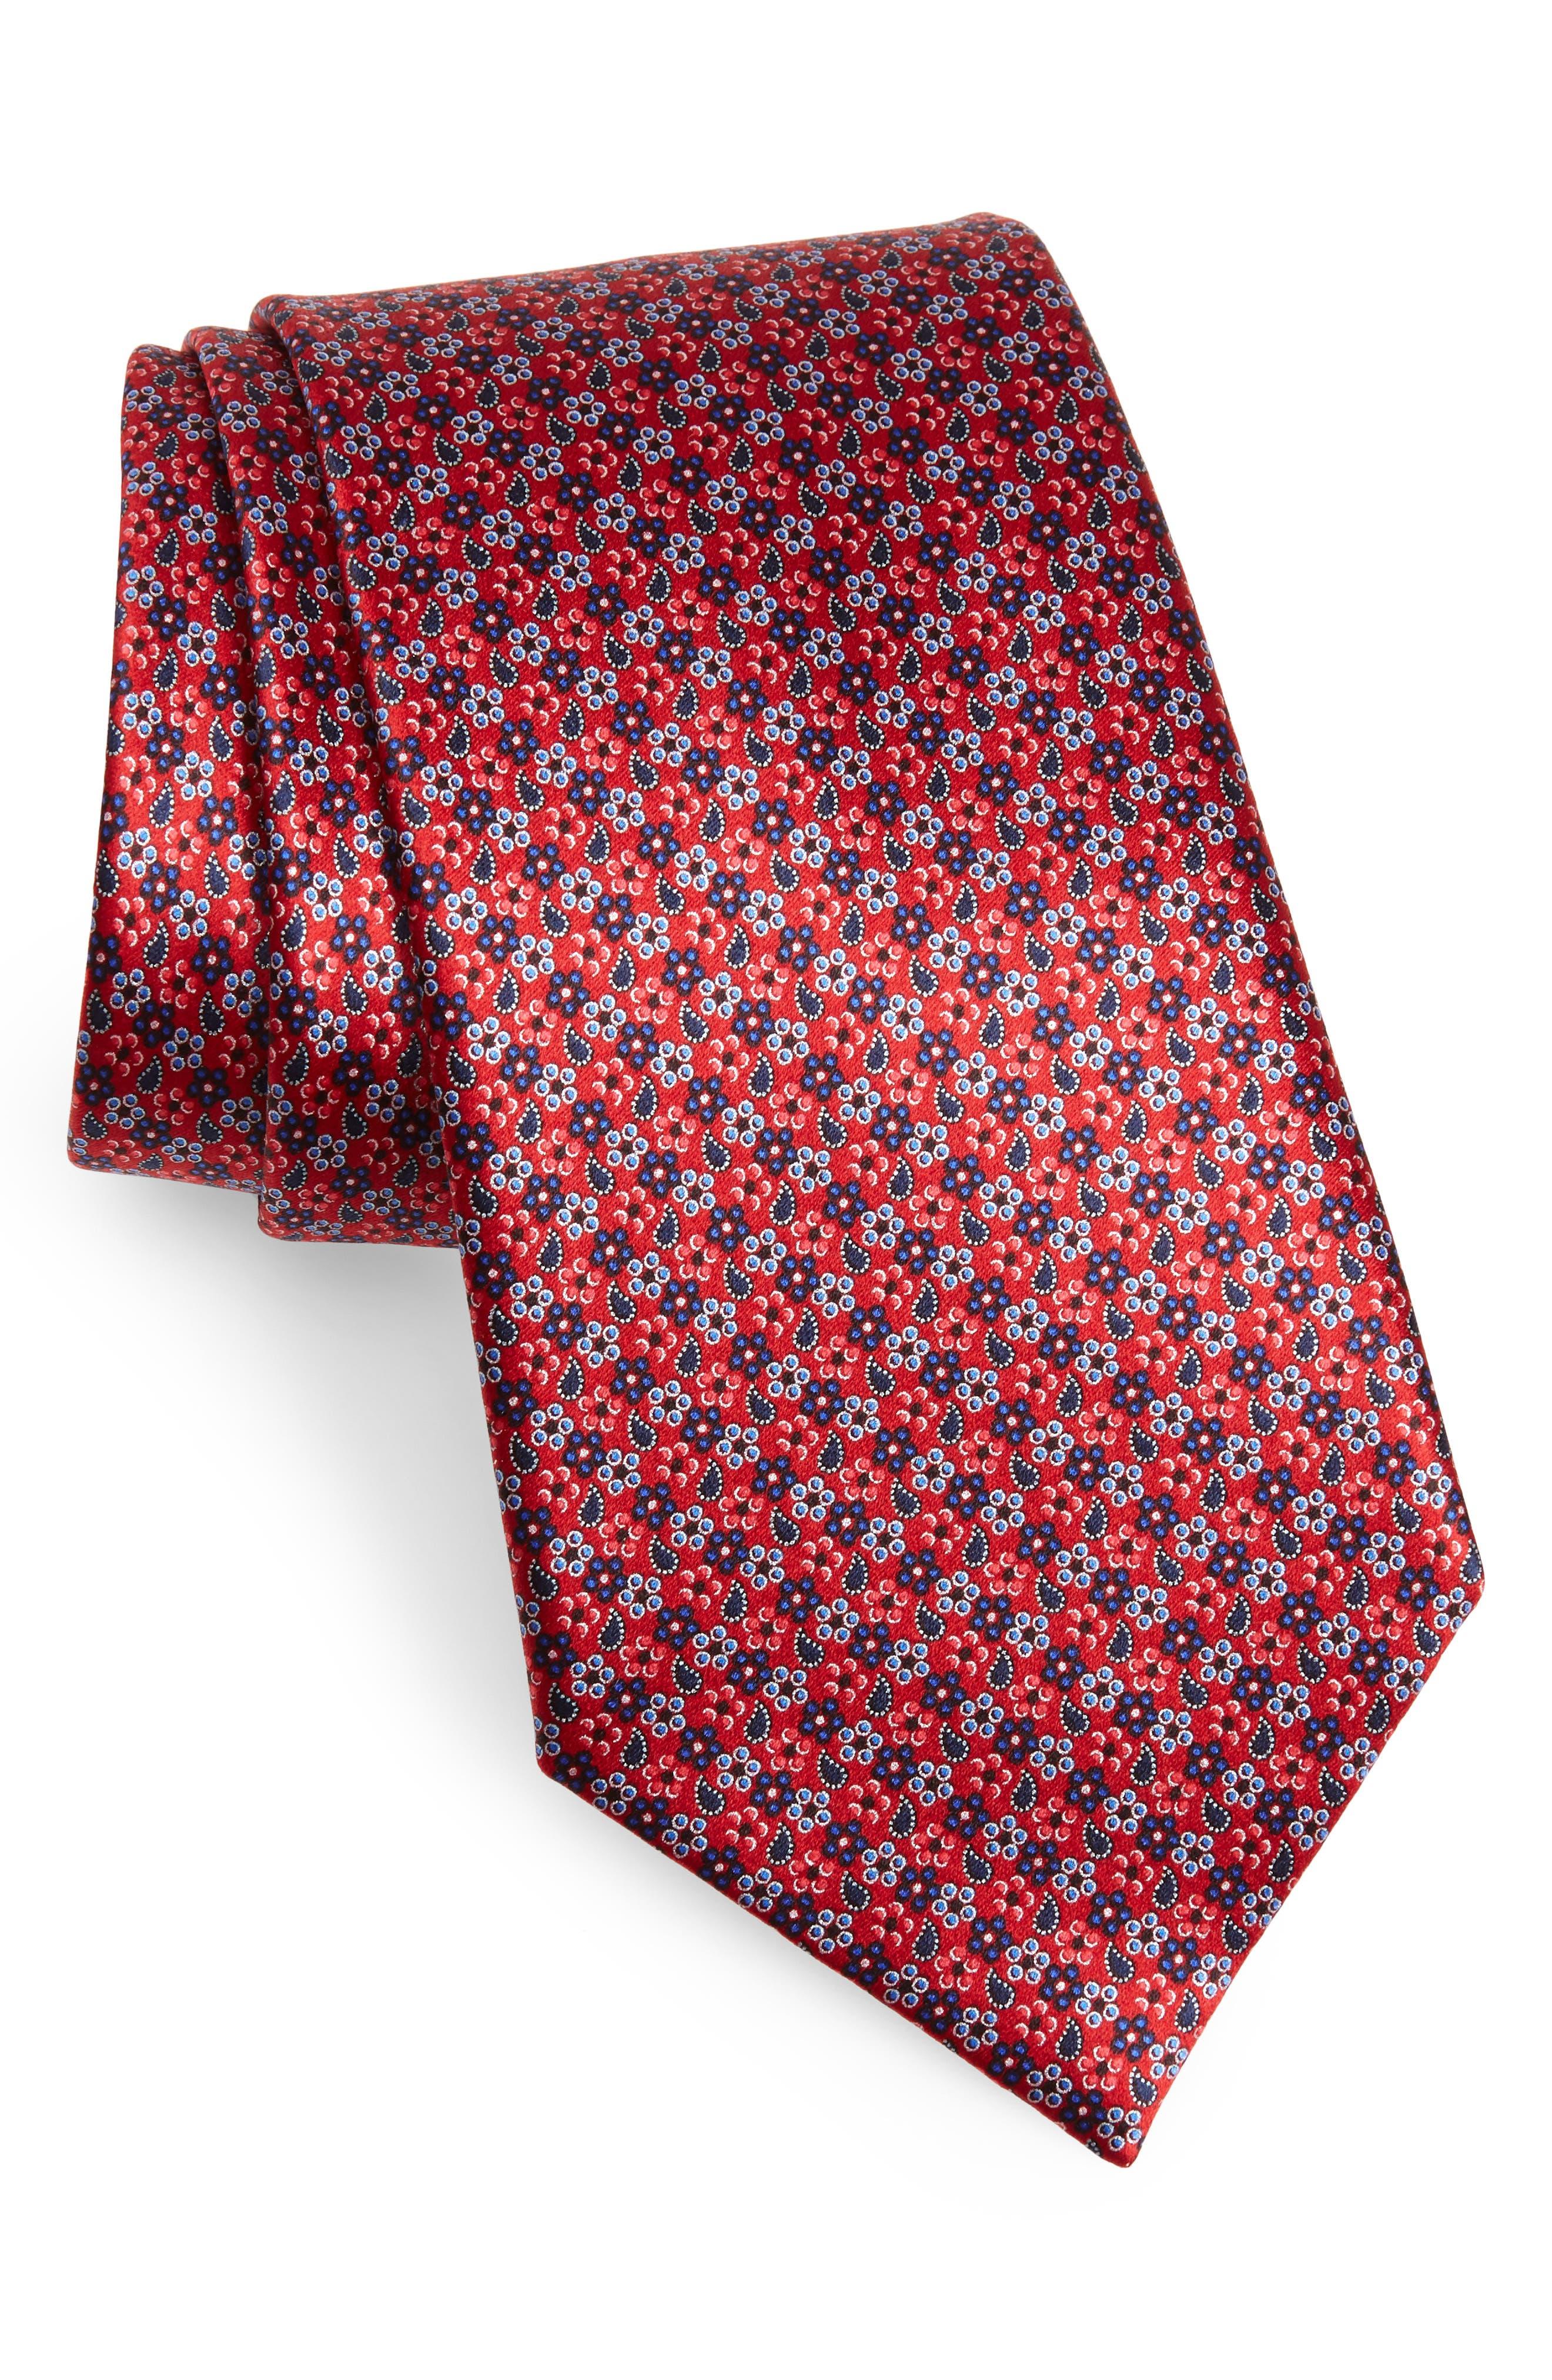 ERMENEGILDO ZEGNA Microfloral Silk Tie, Main, color, 618